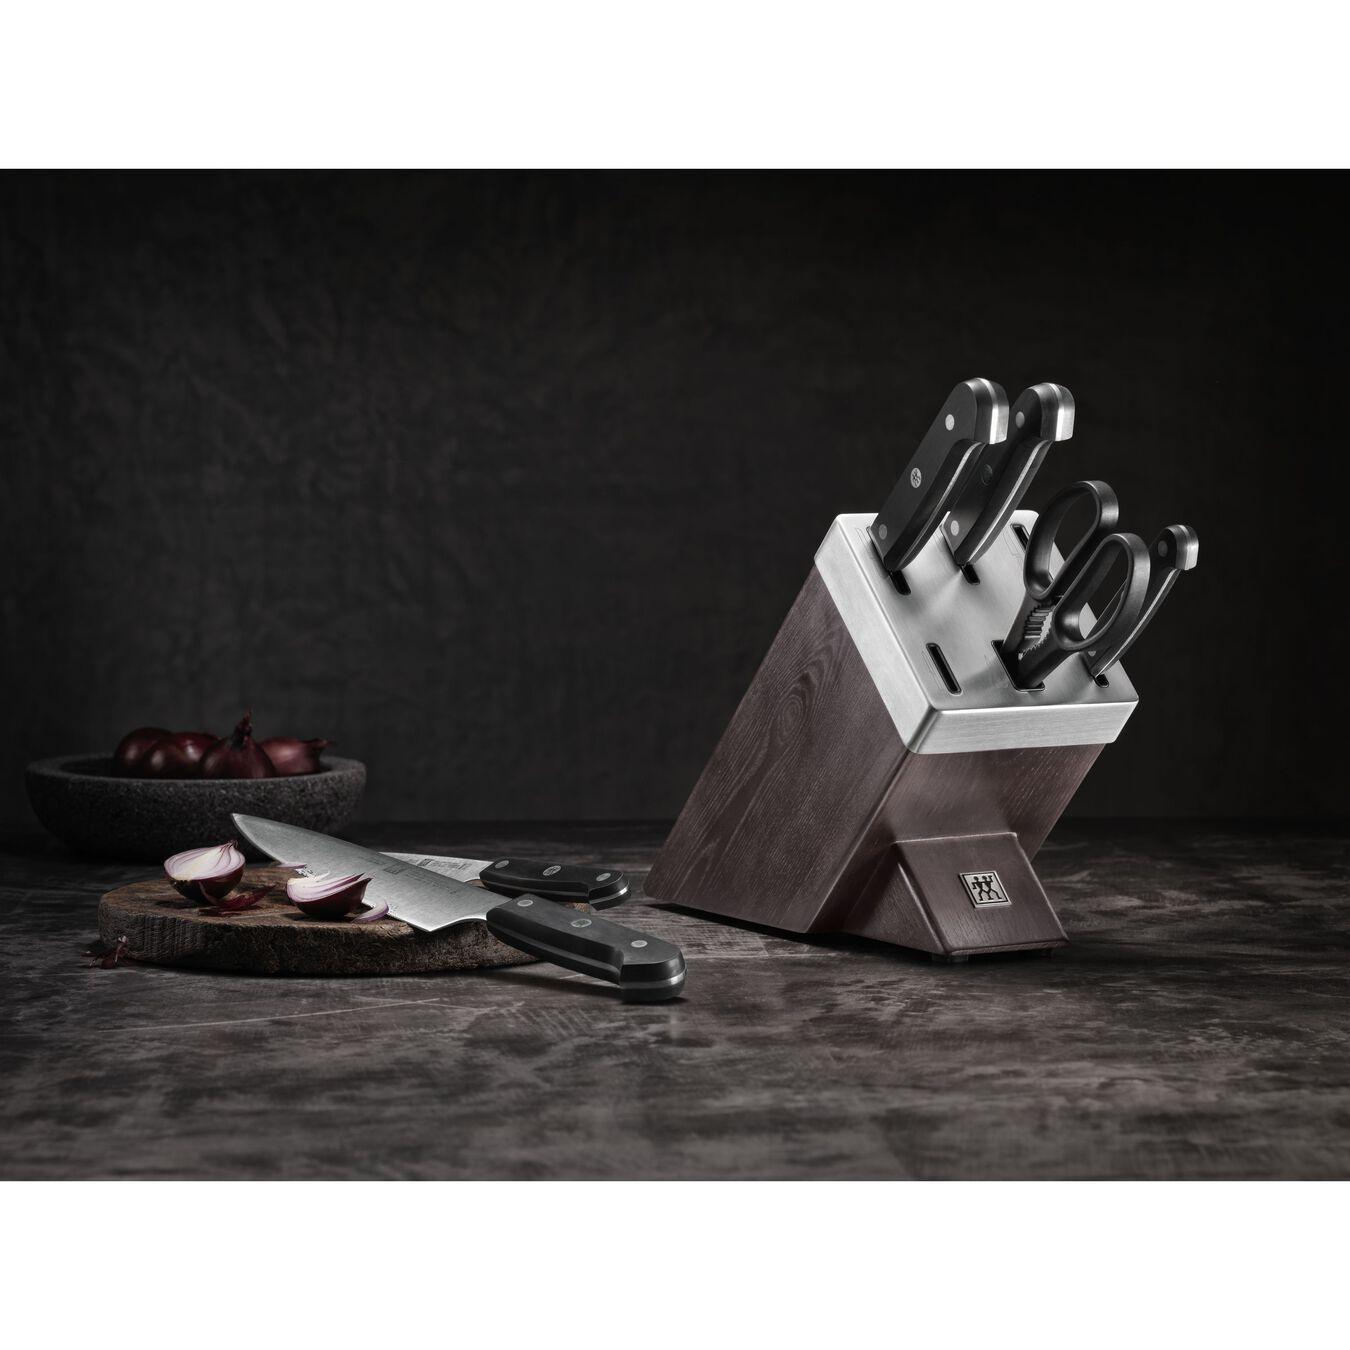 Messenblok met KiS technologie, 7-delig, Essenhout,,large 7